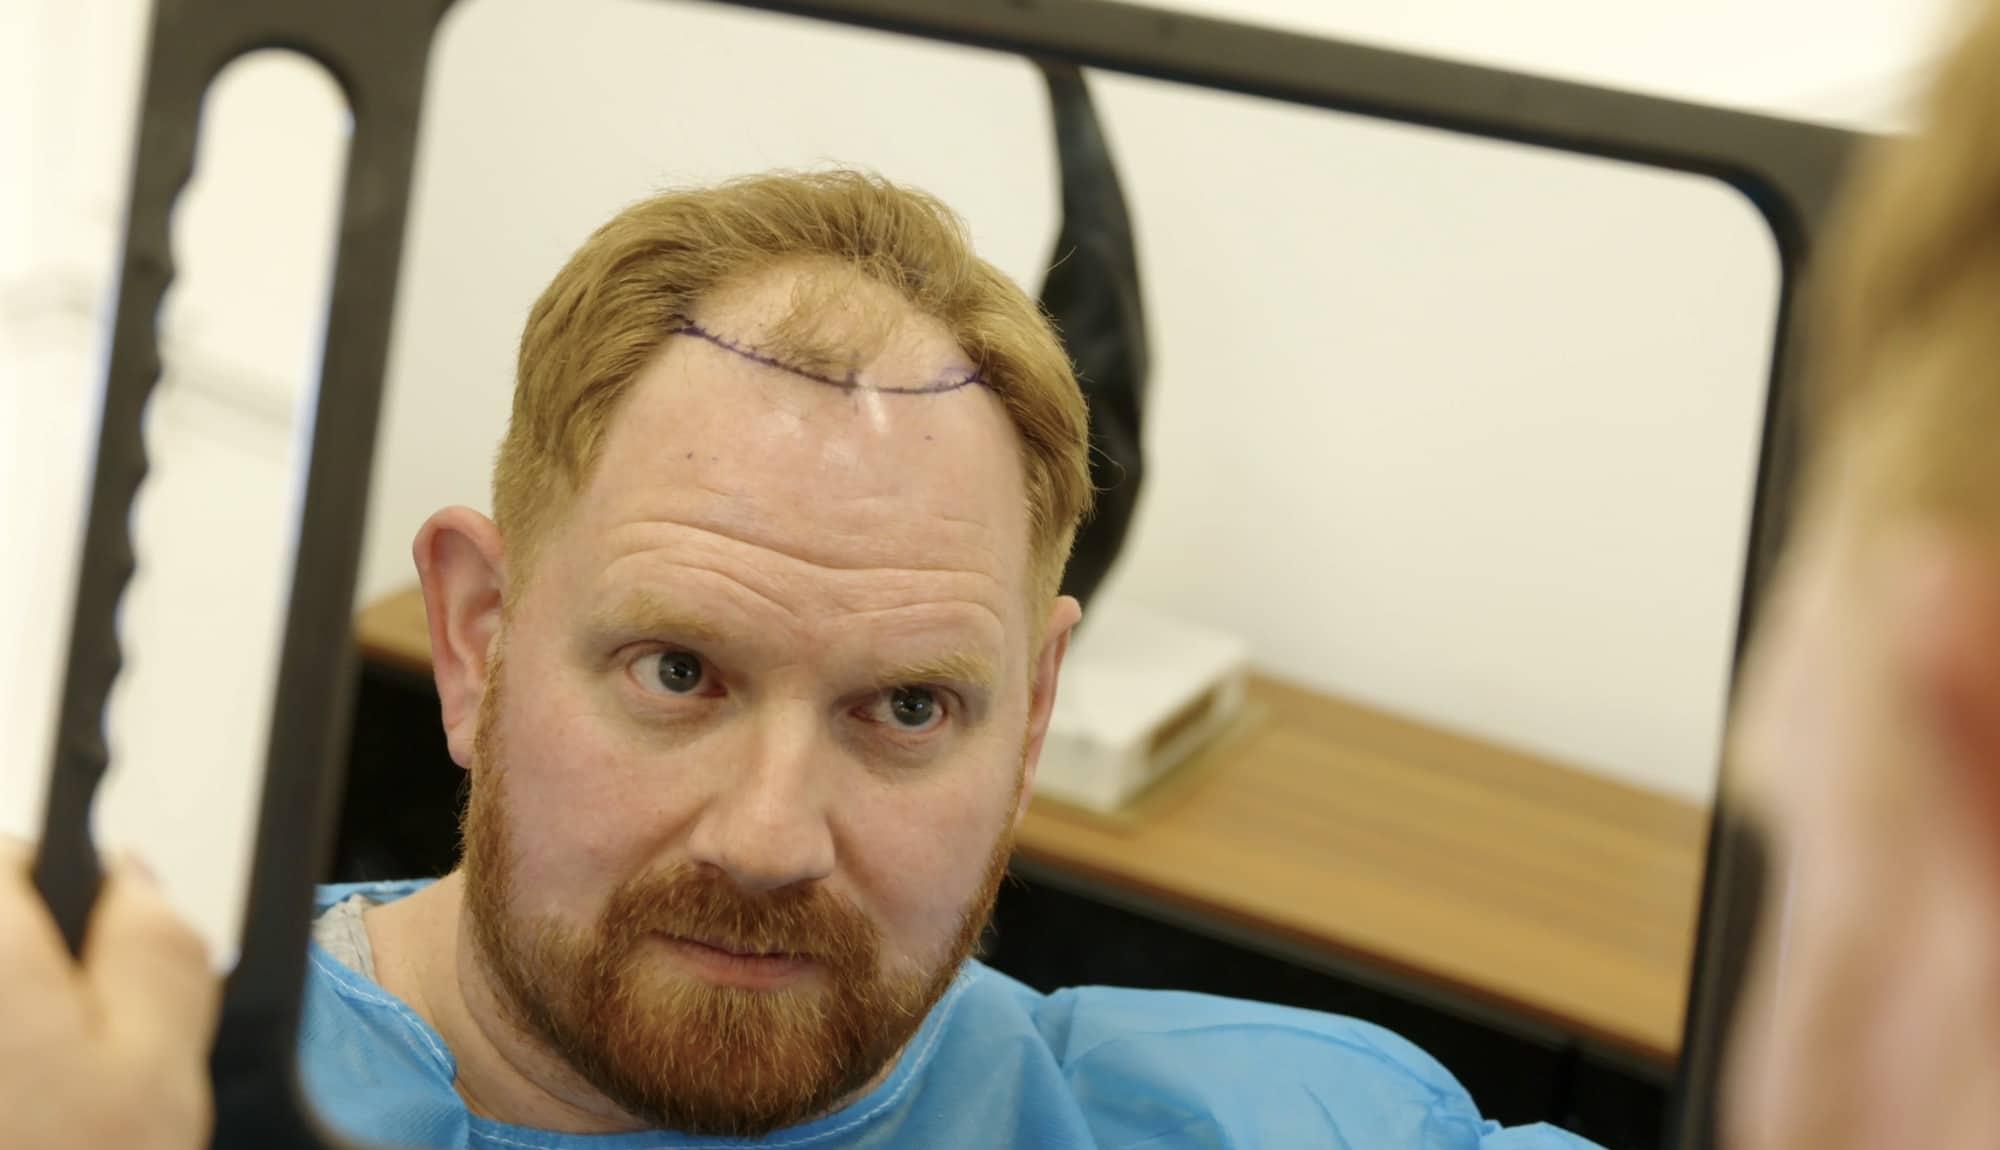 During Hair Transplant